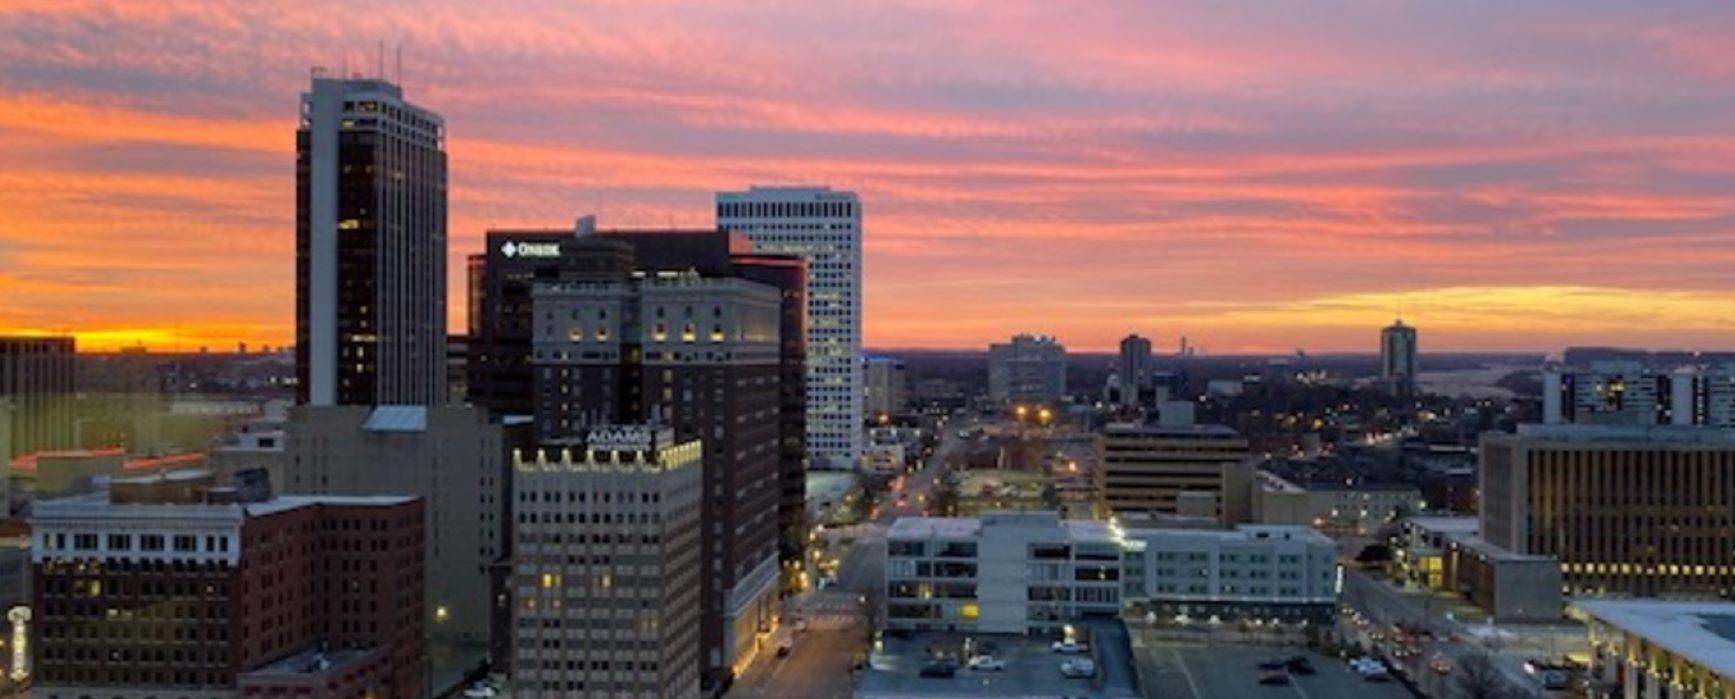 Tulsa city skyline